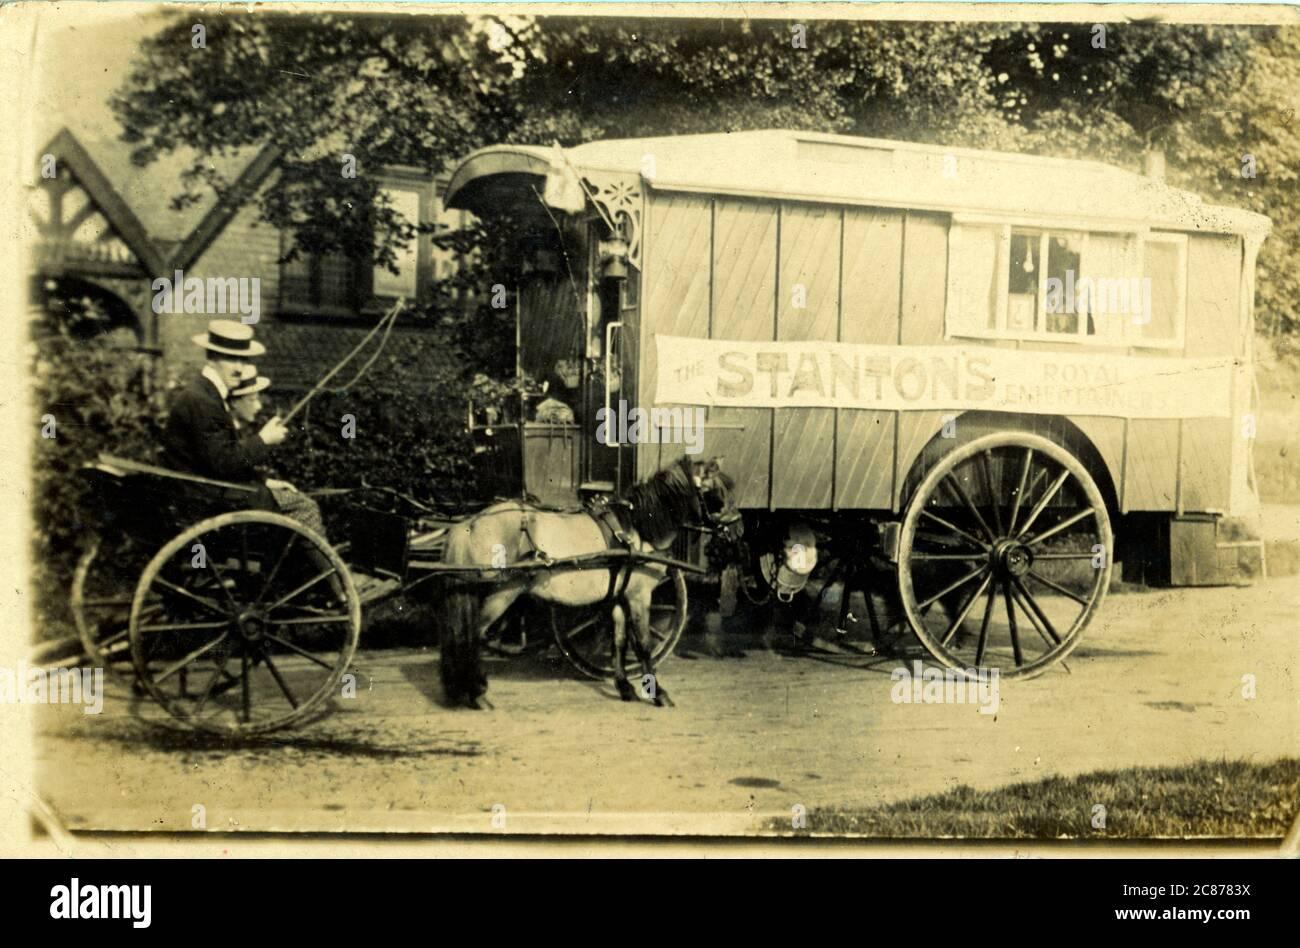 Vintage Caravan (Stanton's Royal Entertainers), Derby, Derbyshire, Inghilterra. Foto Stock